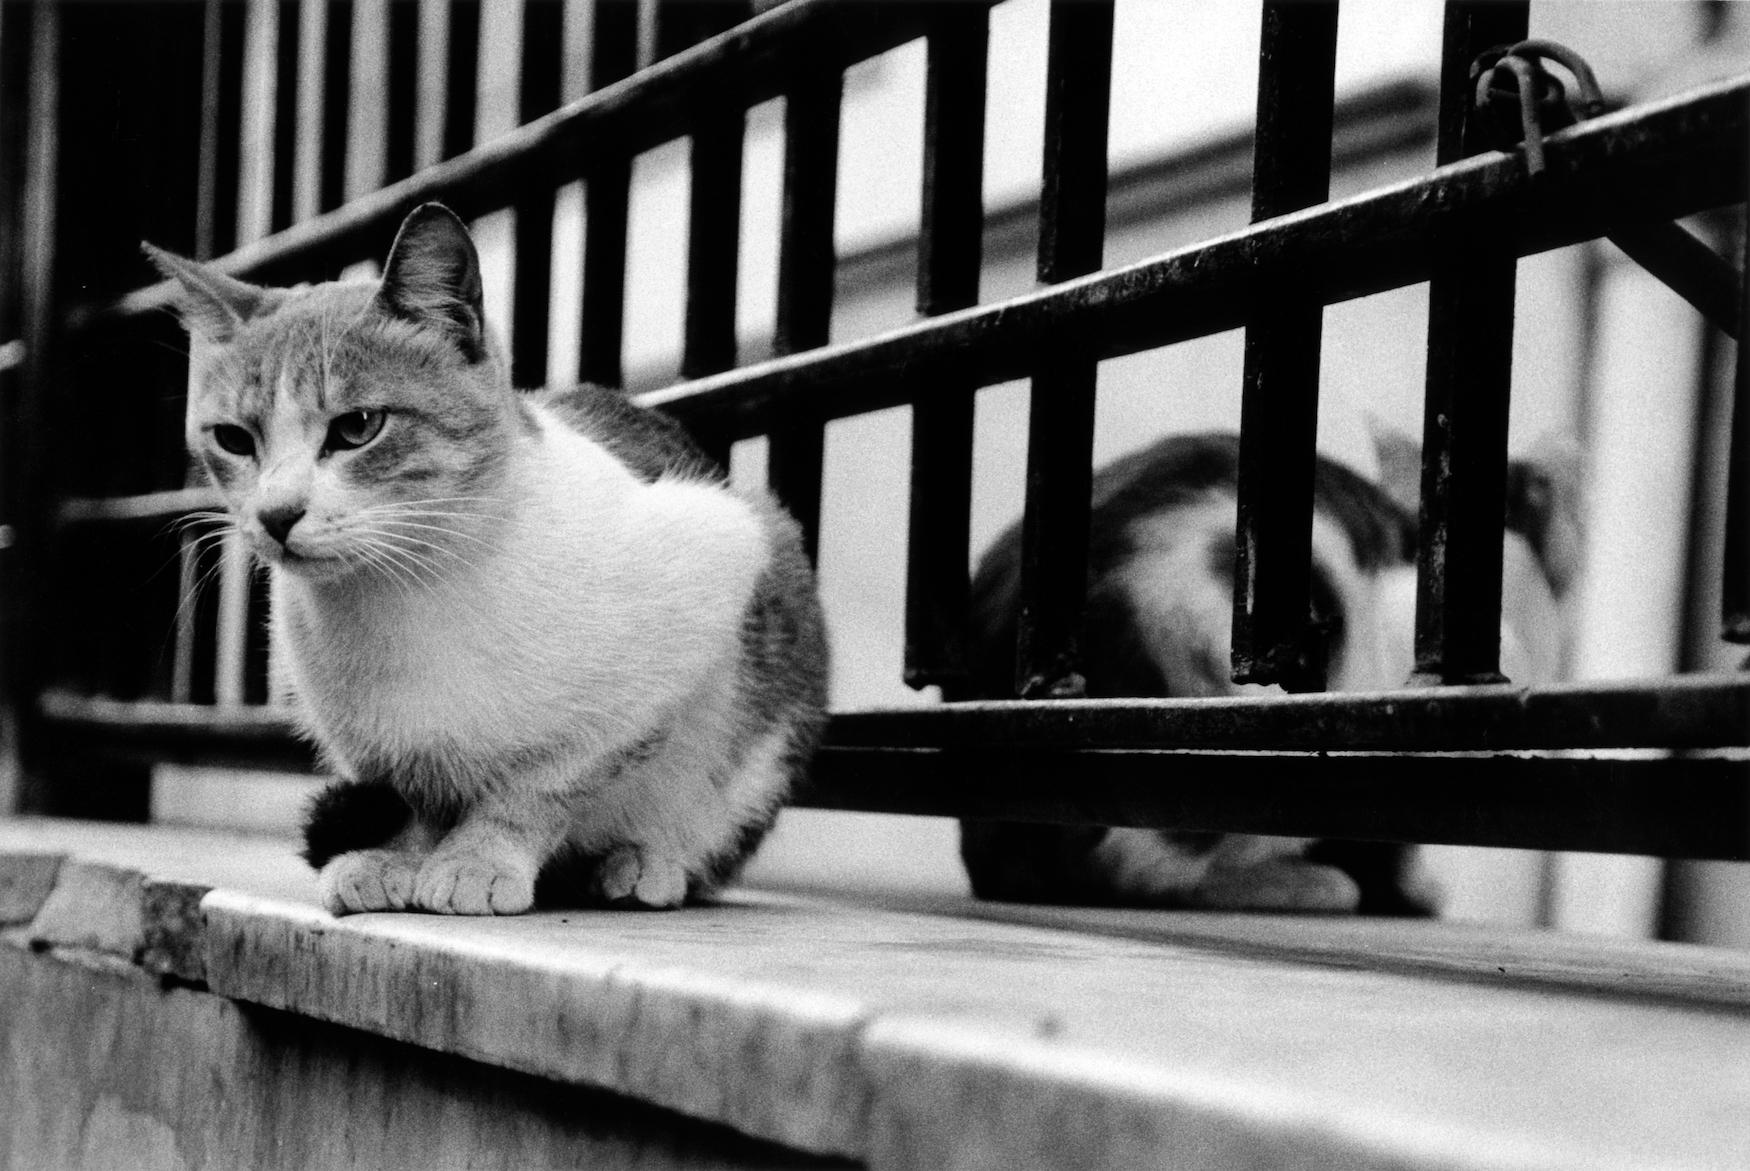 walter_rothwell_photography_cats-025.jpg